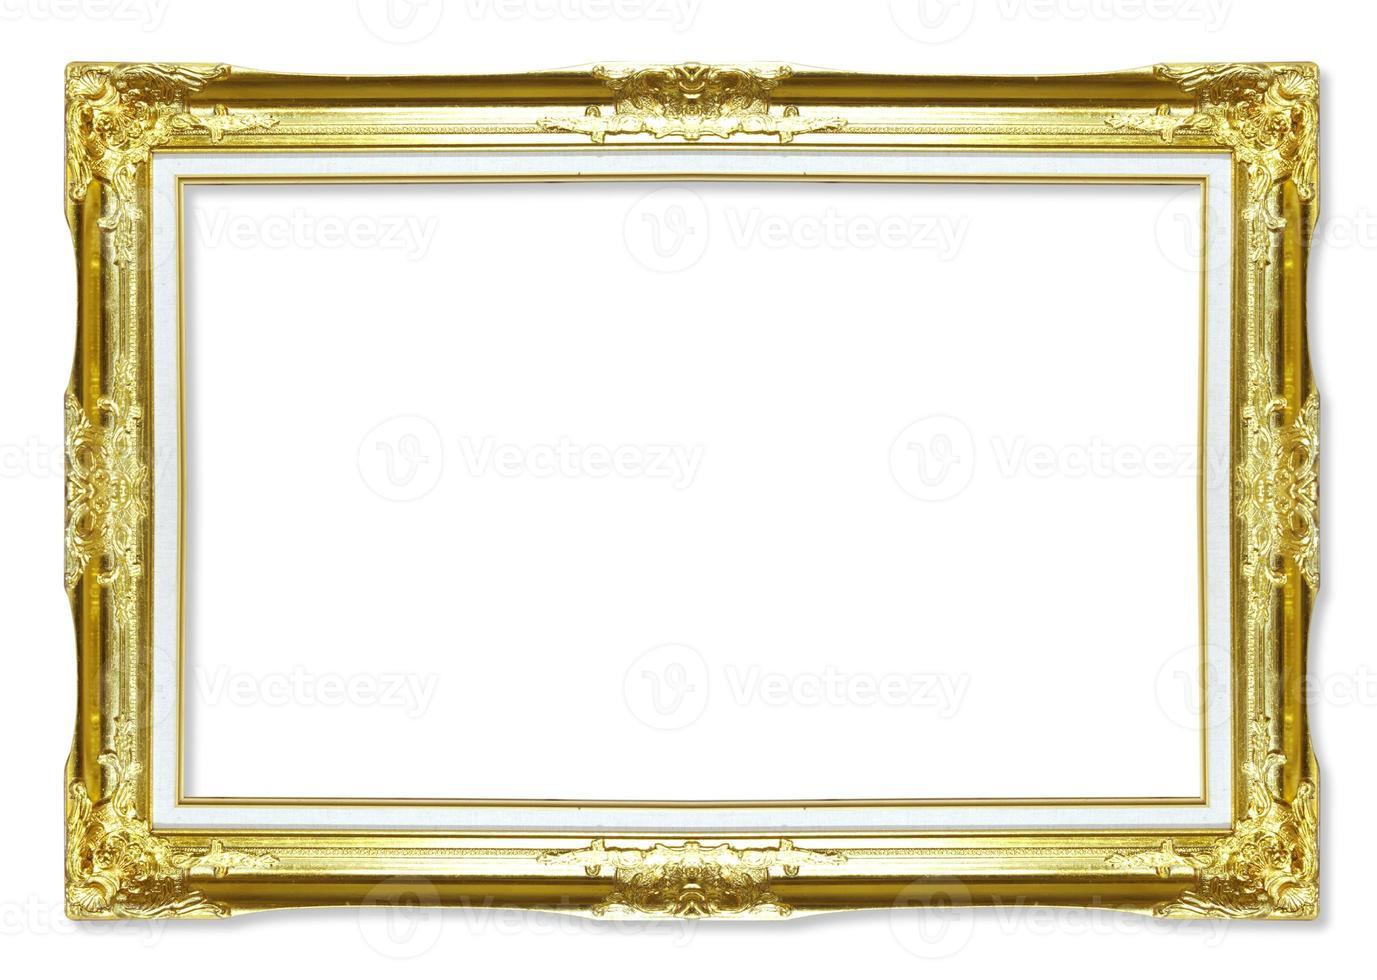 ouro molduras antigas. isolado em fundo branco foto